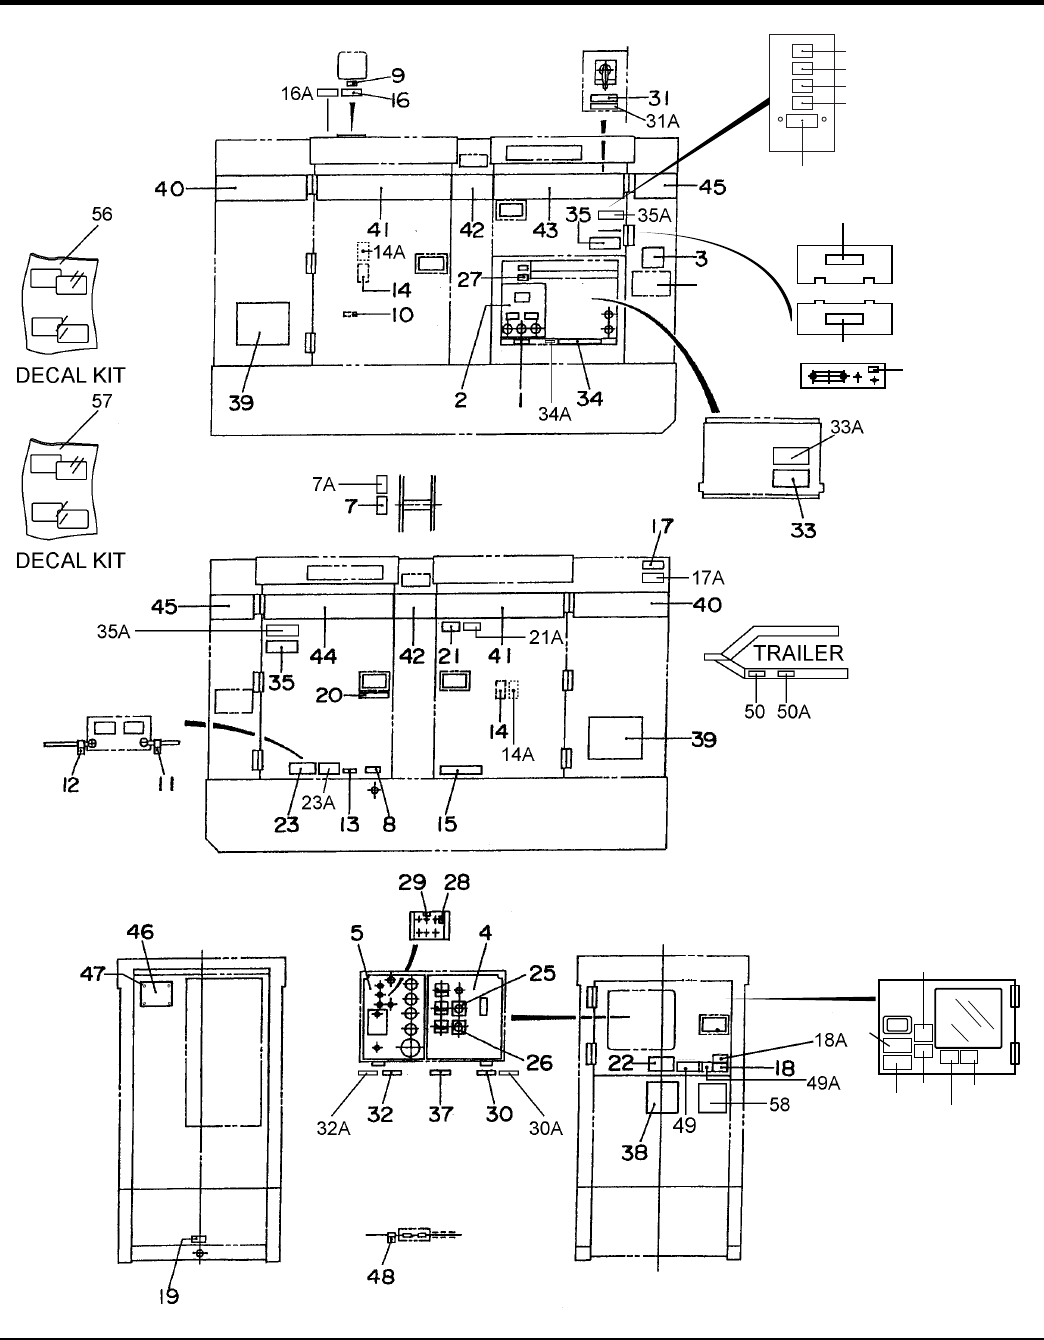 Multiquip Portable Generator Dca70Us13Can Users Manual